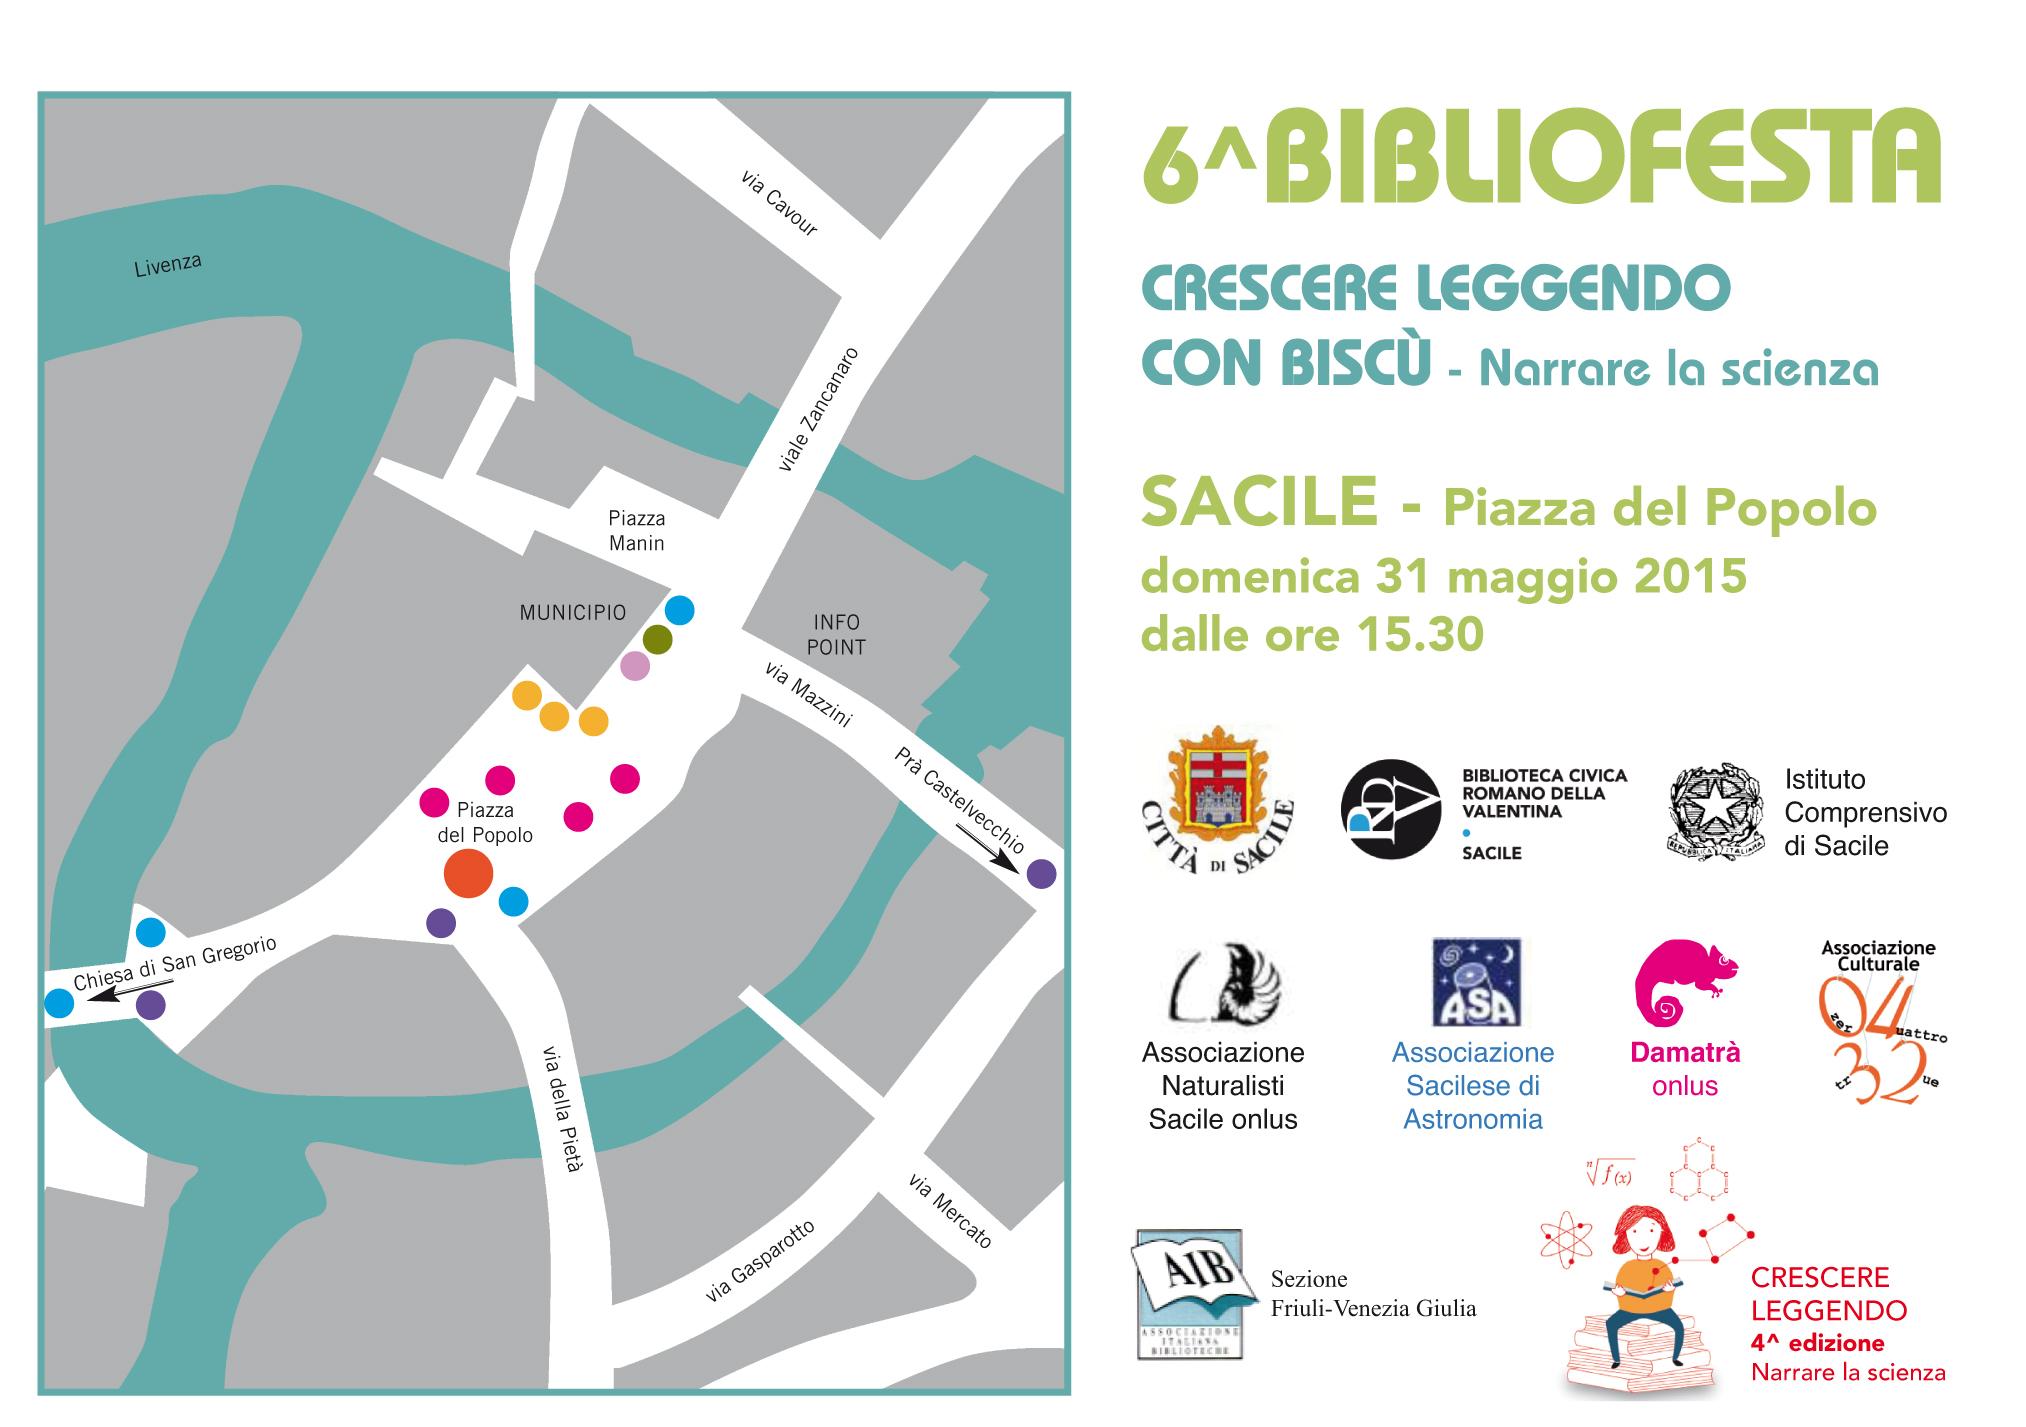 mappa bibliofesta